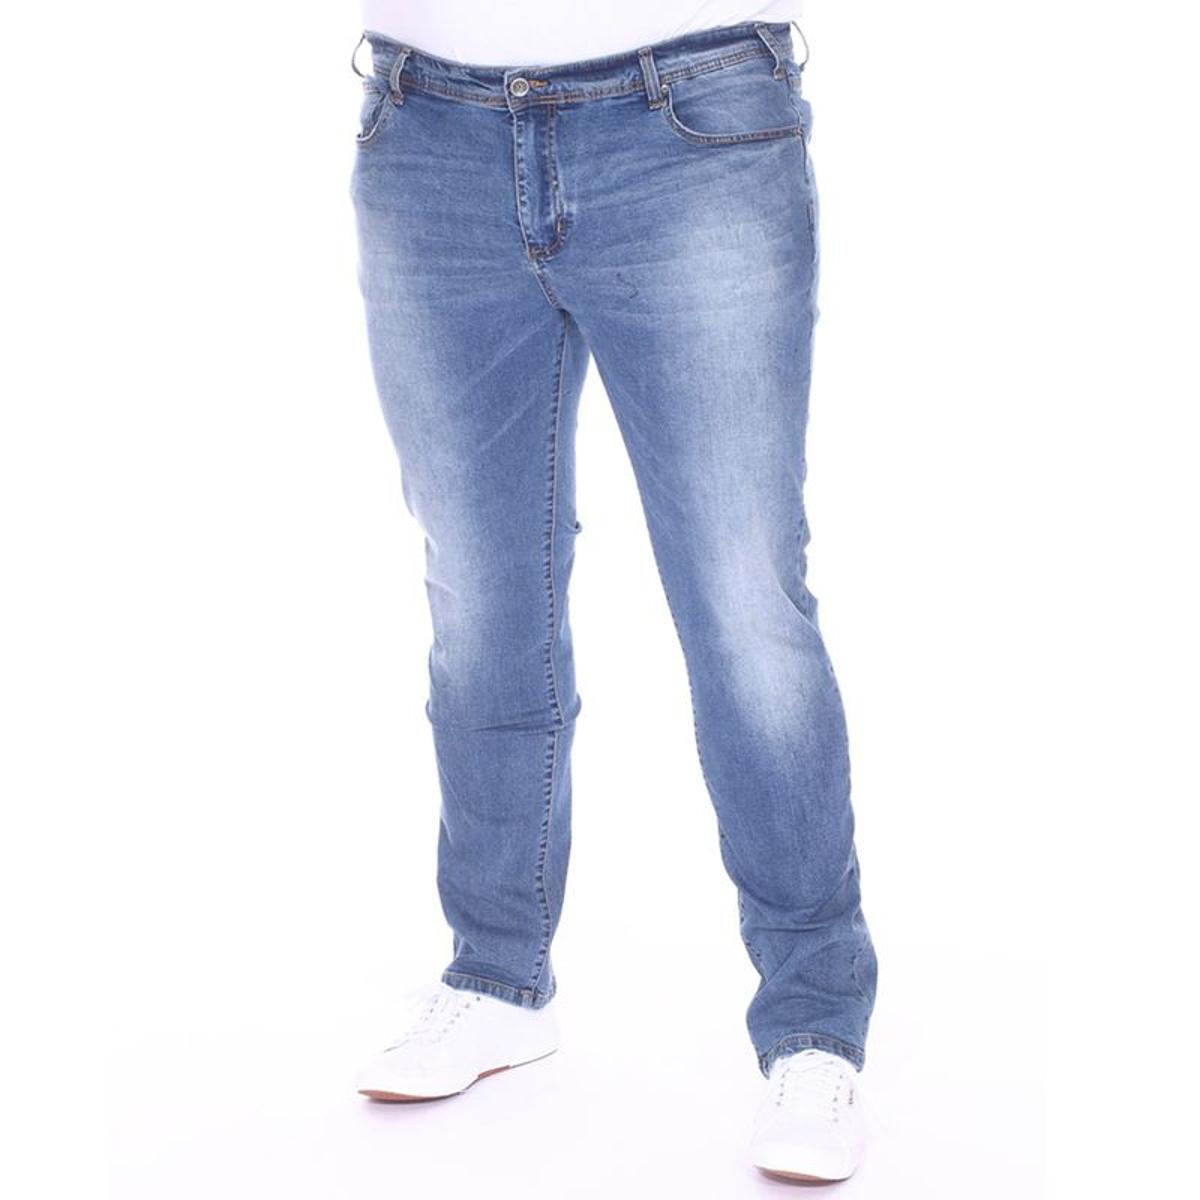 Jeans Elasthane, Polyester, Viscose